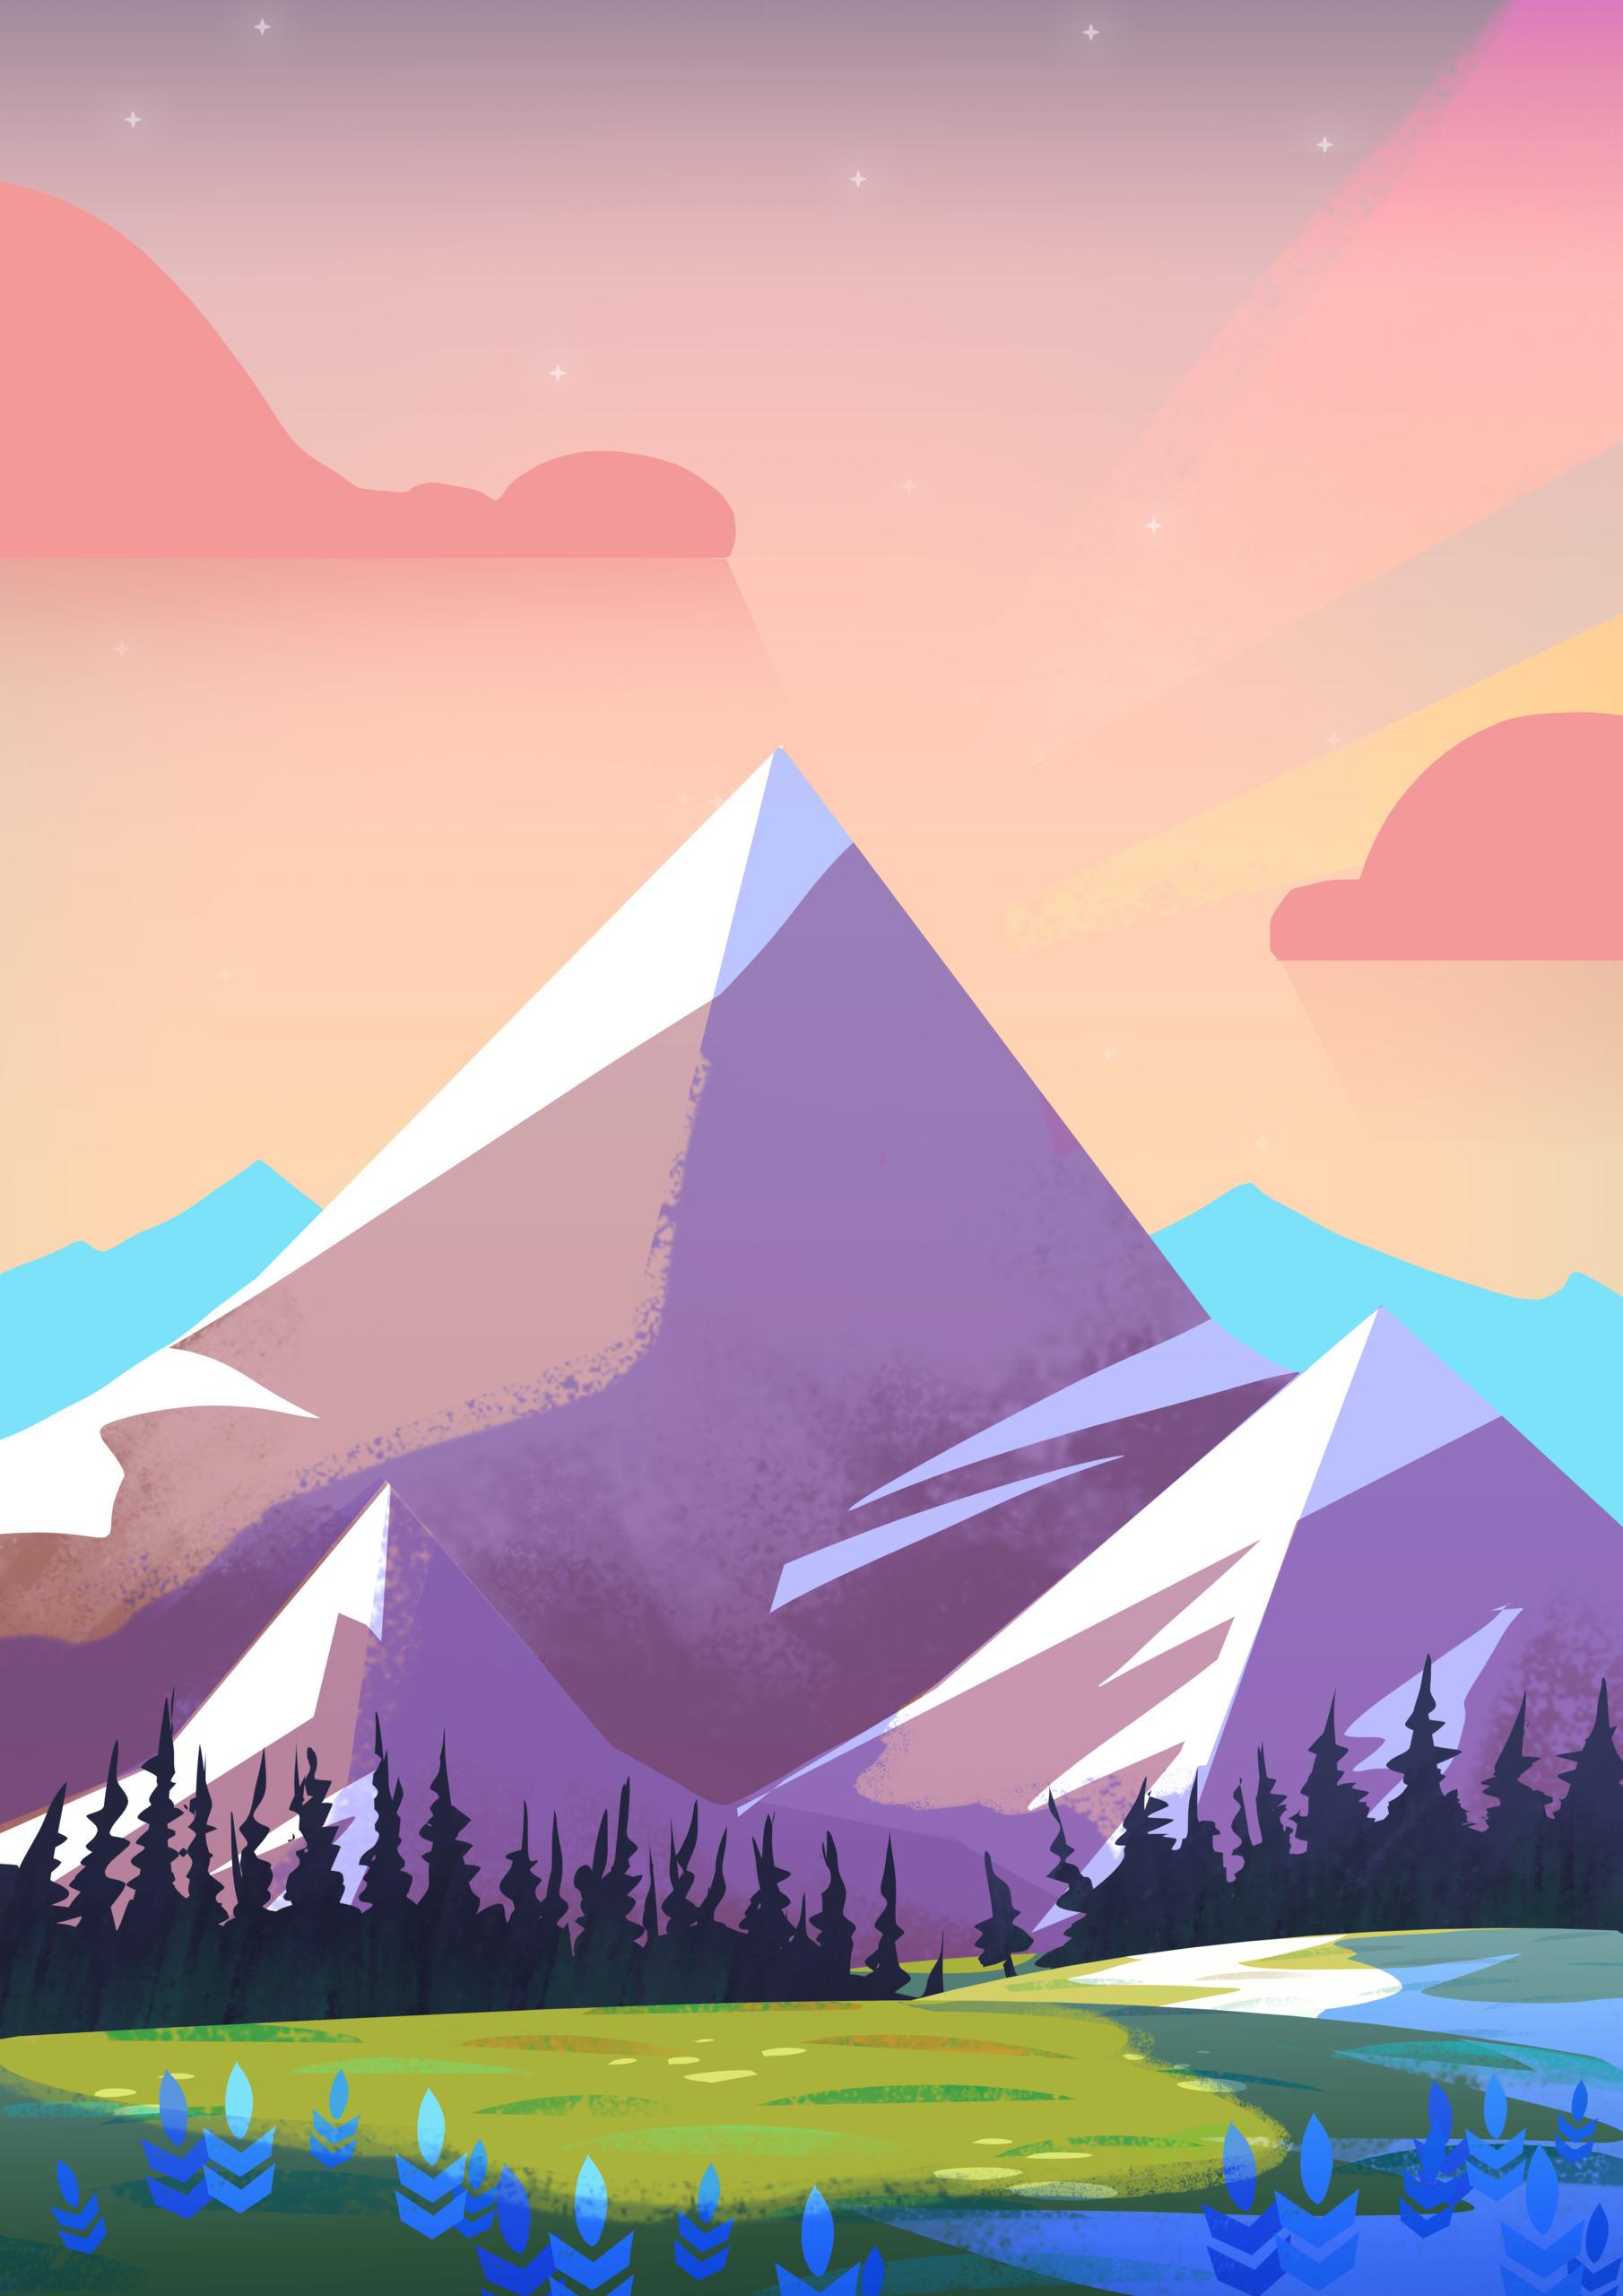 illustration, design - oartey | ello